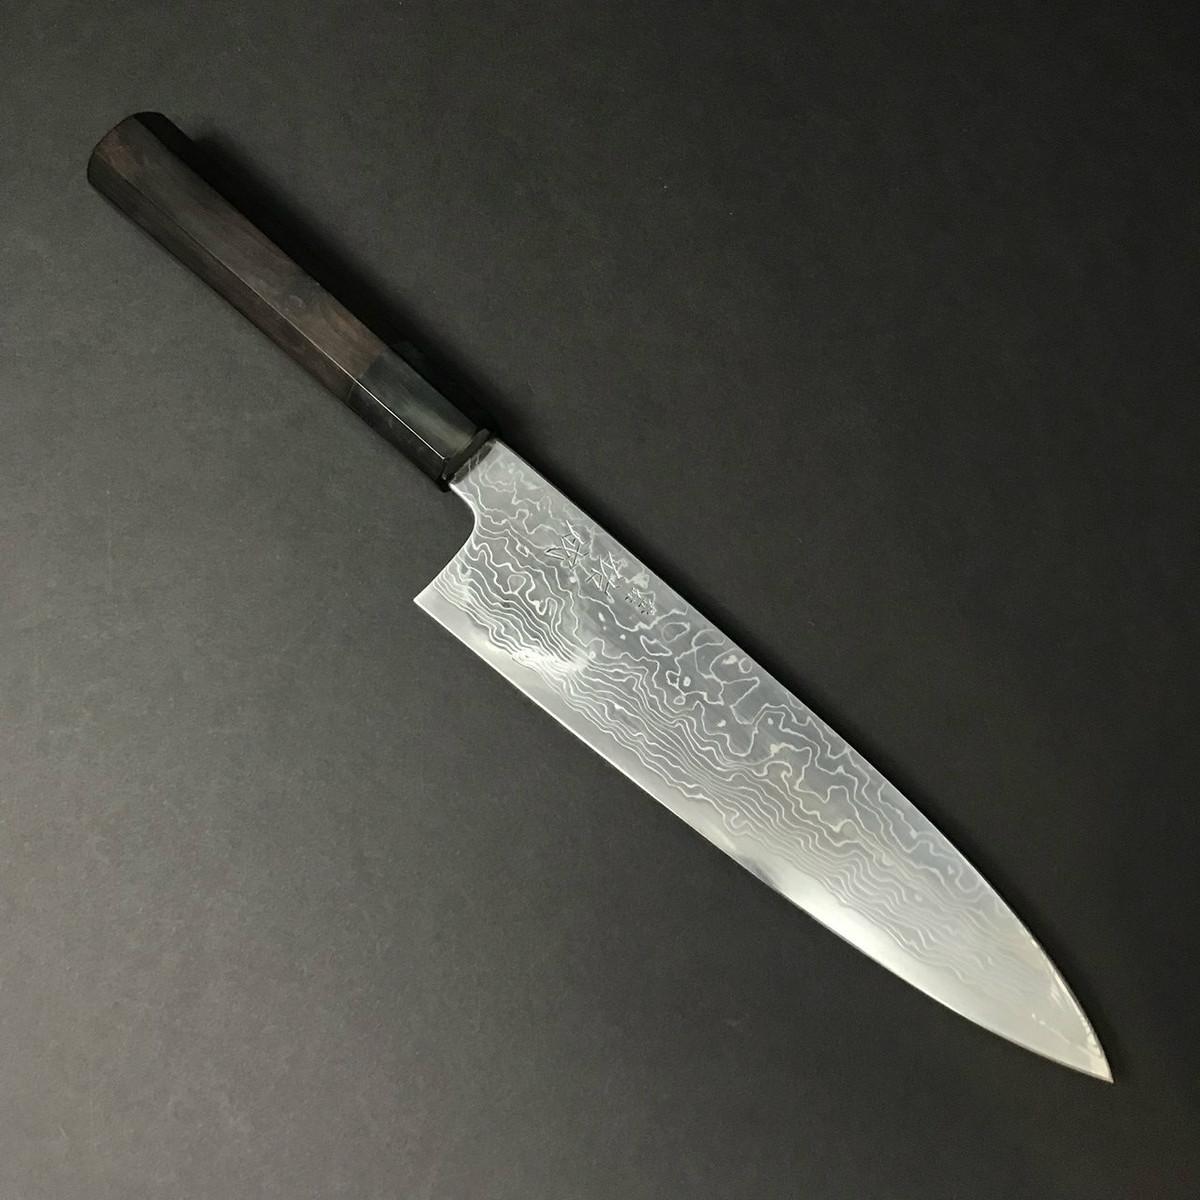 Sukenari - SG2 Damascus - Gyuto 210mm